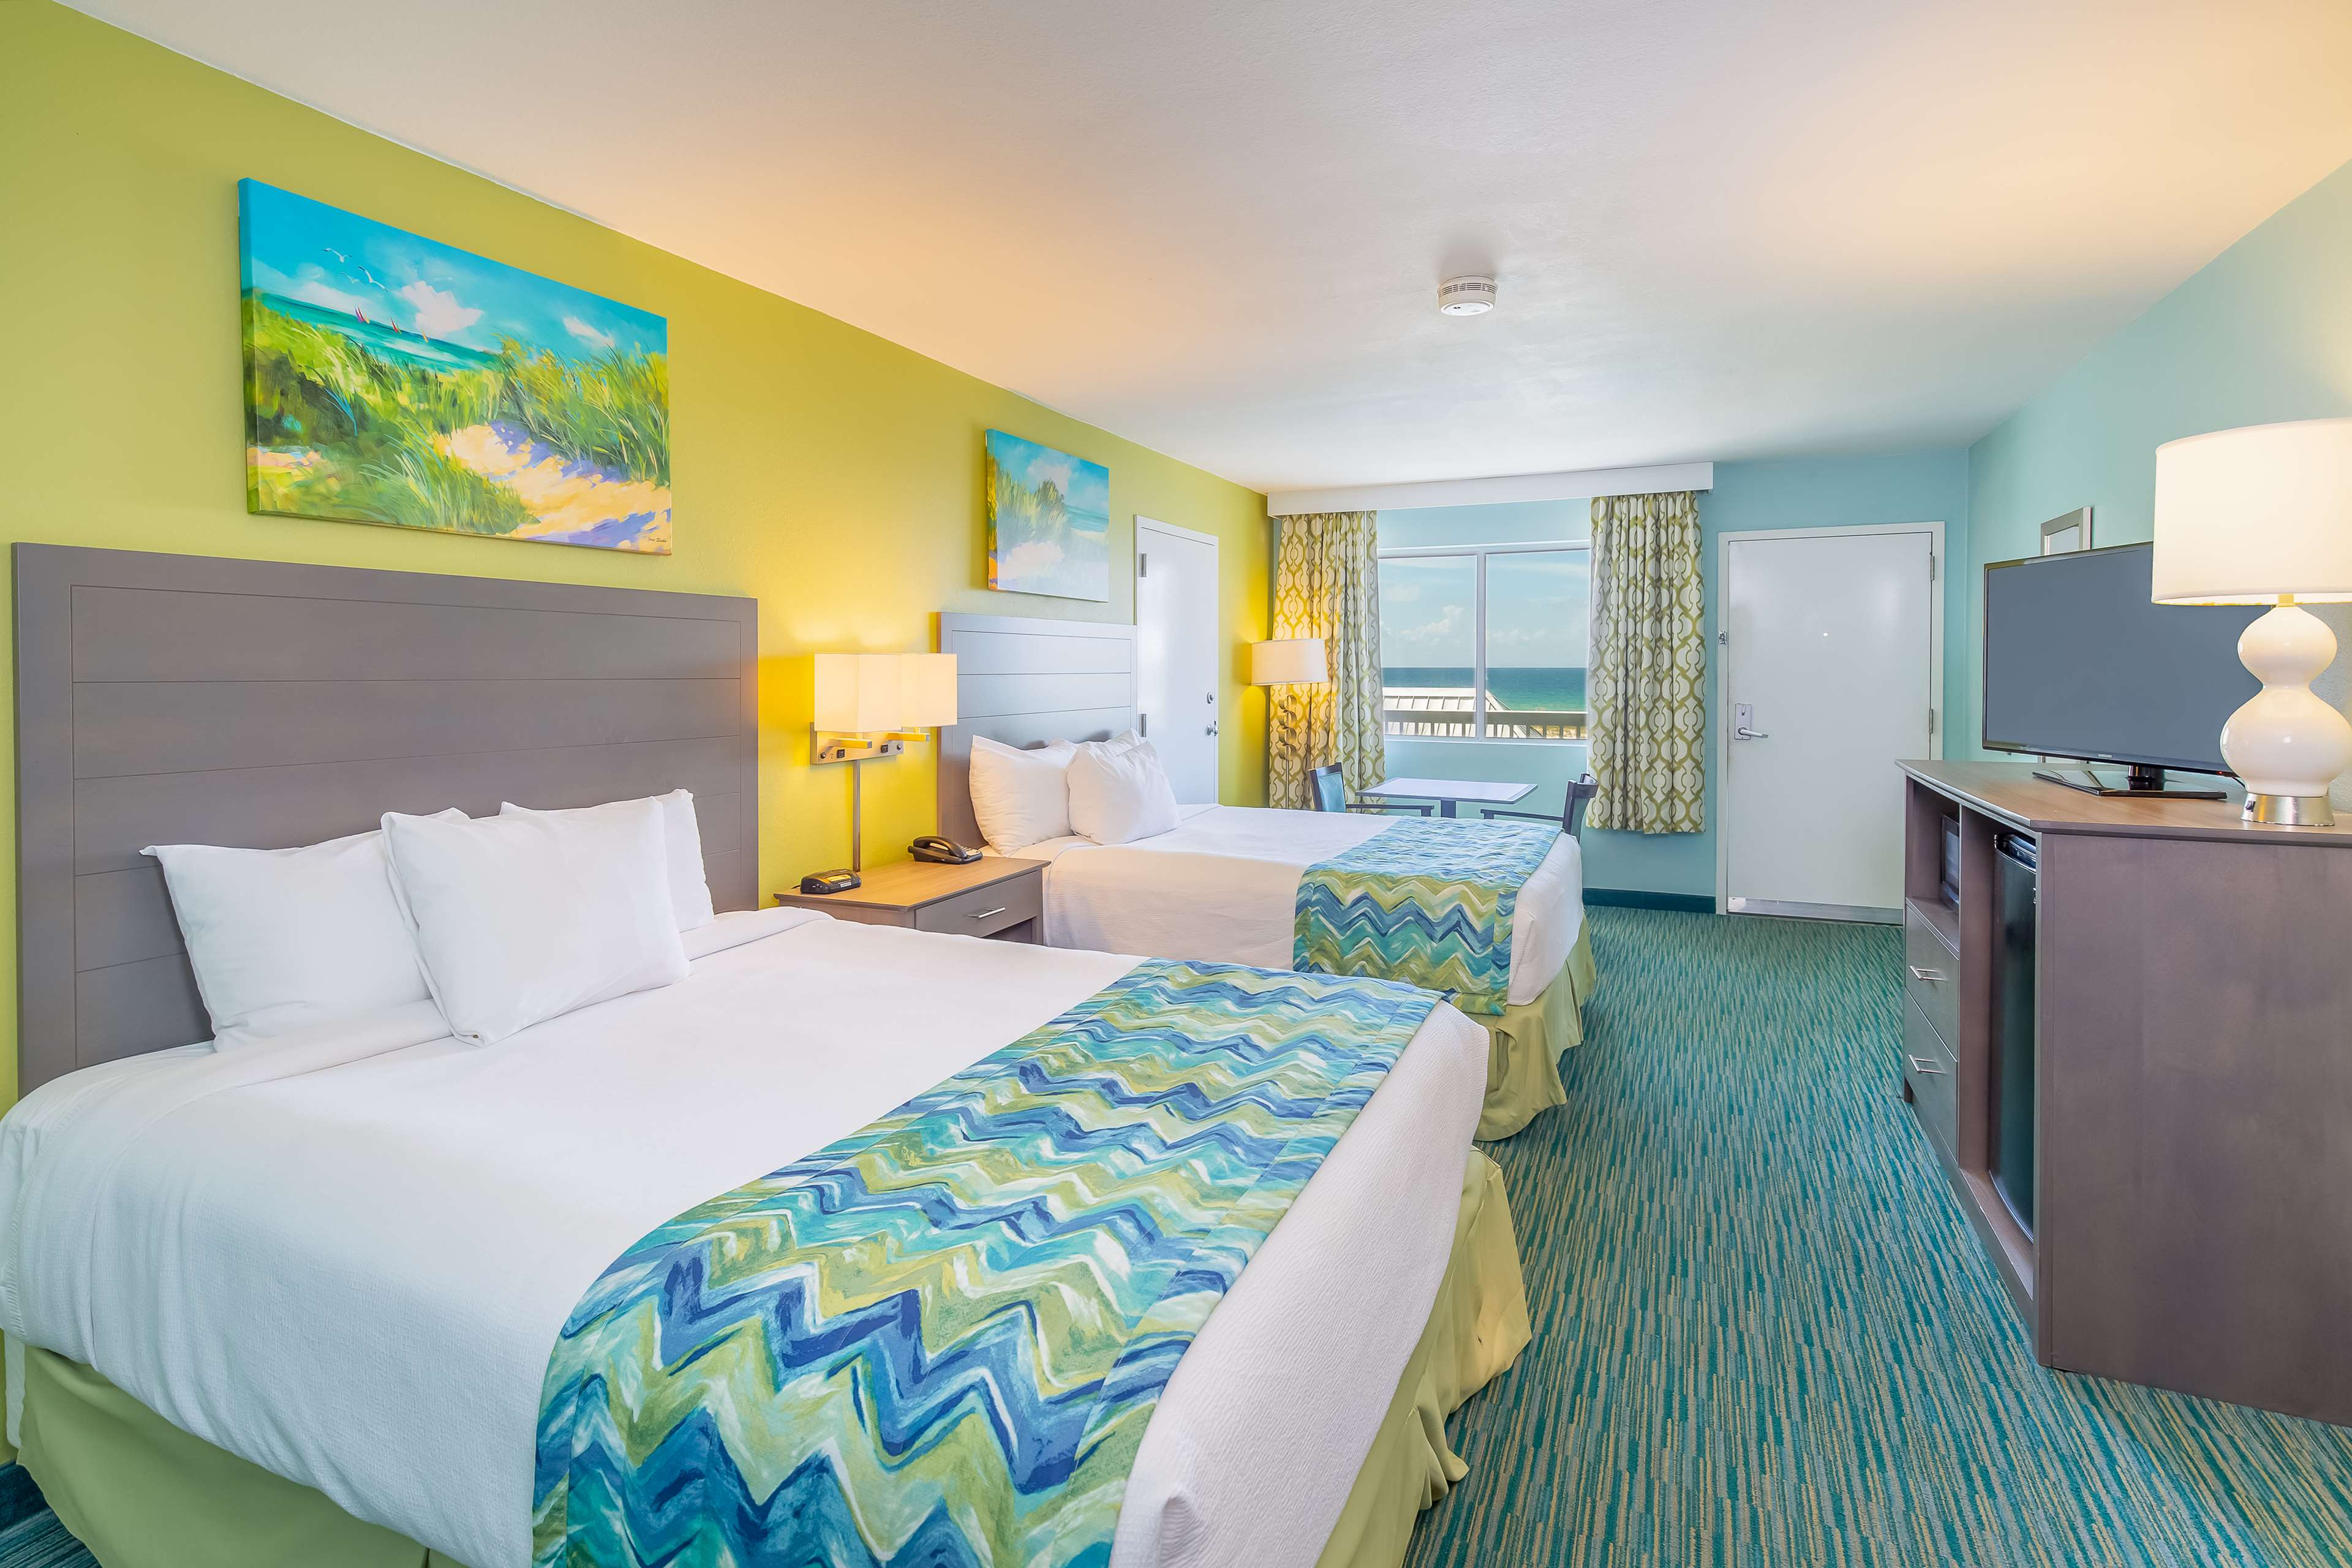 Best Western Beachside Resort image 24